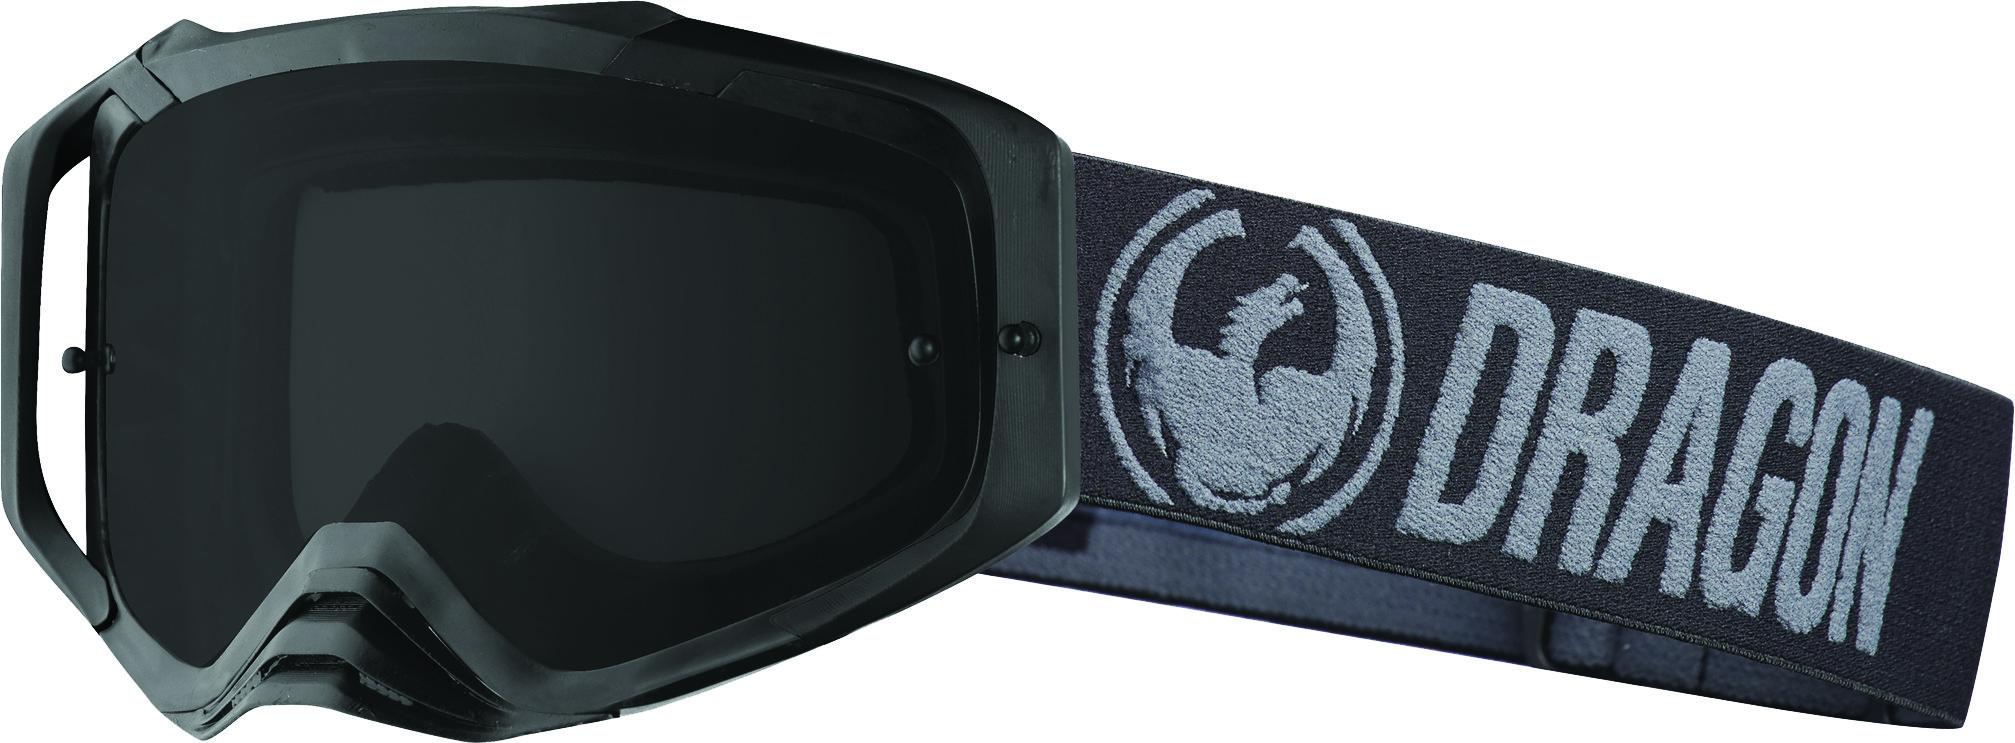 Mxv Max Goggle Black W/Smoke Lens